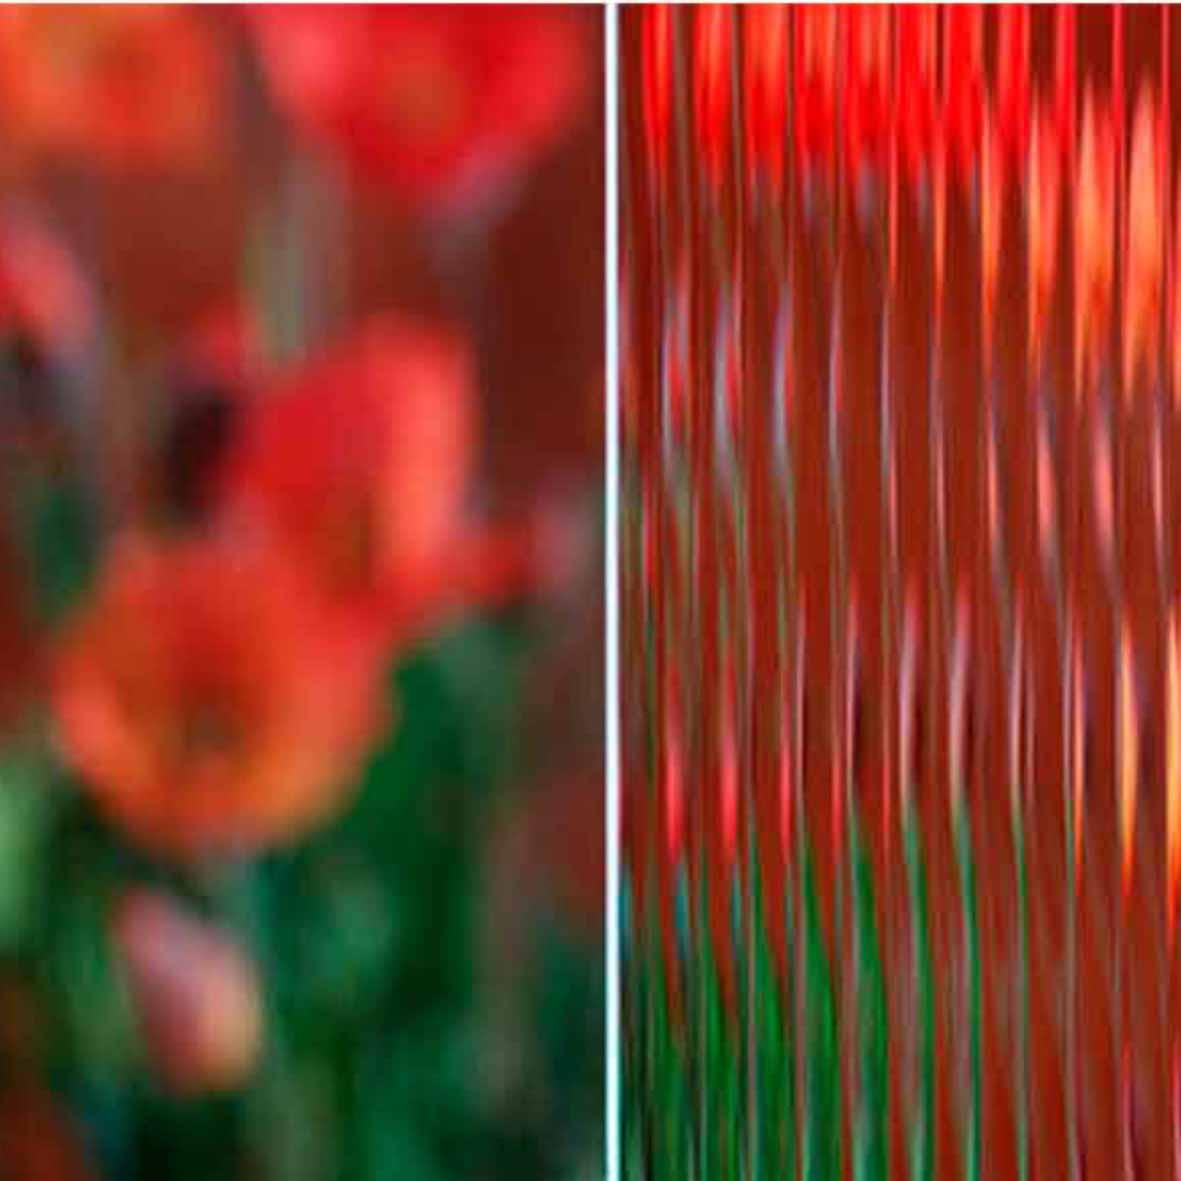 Thin Reeded Glass Design Plus London